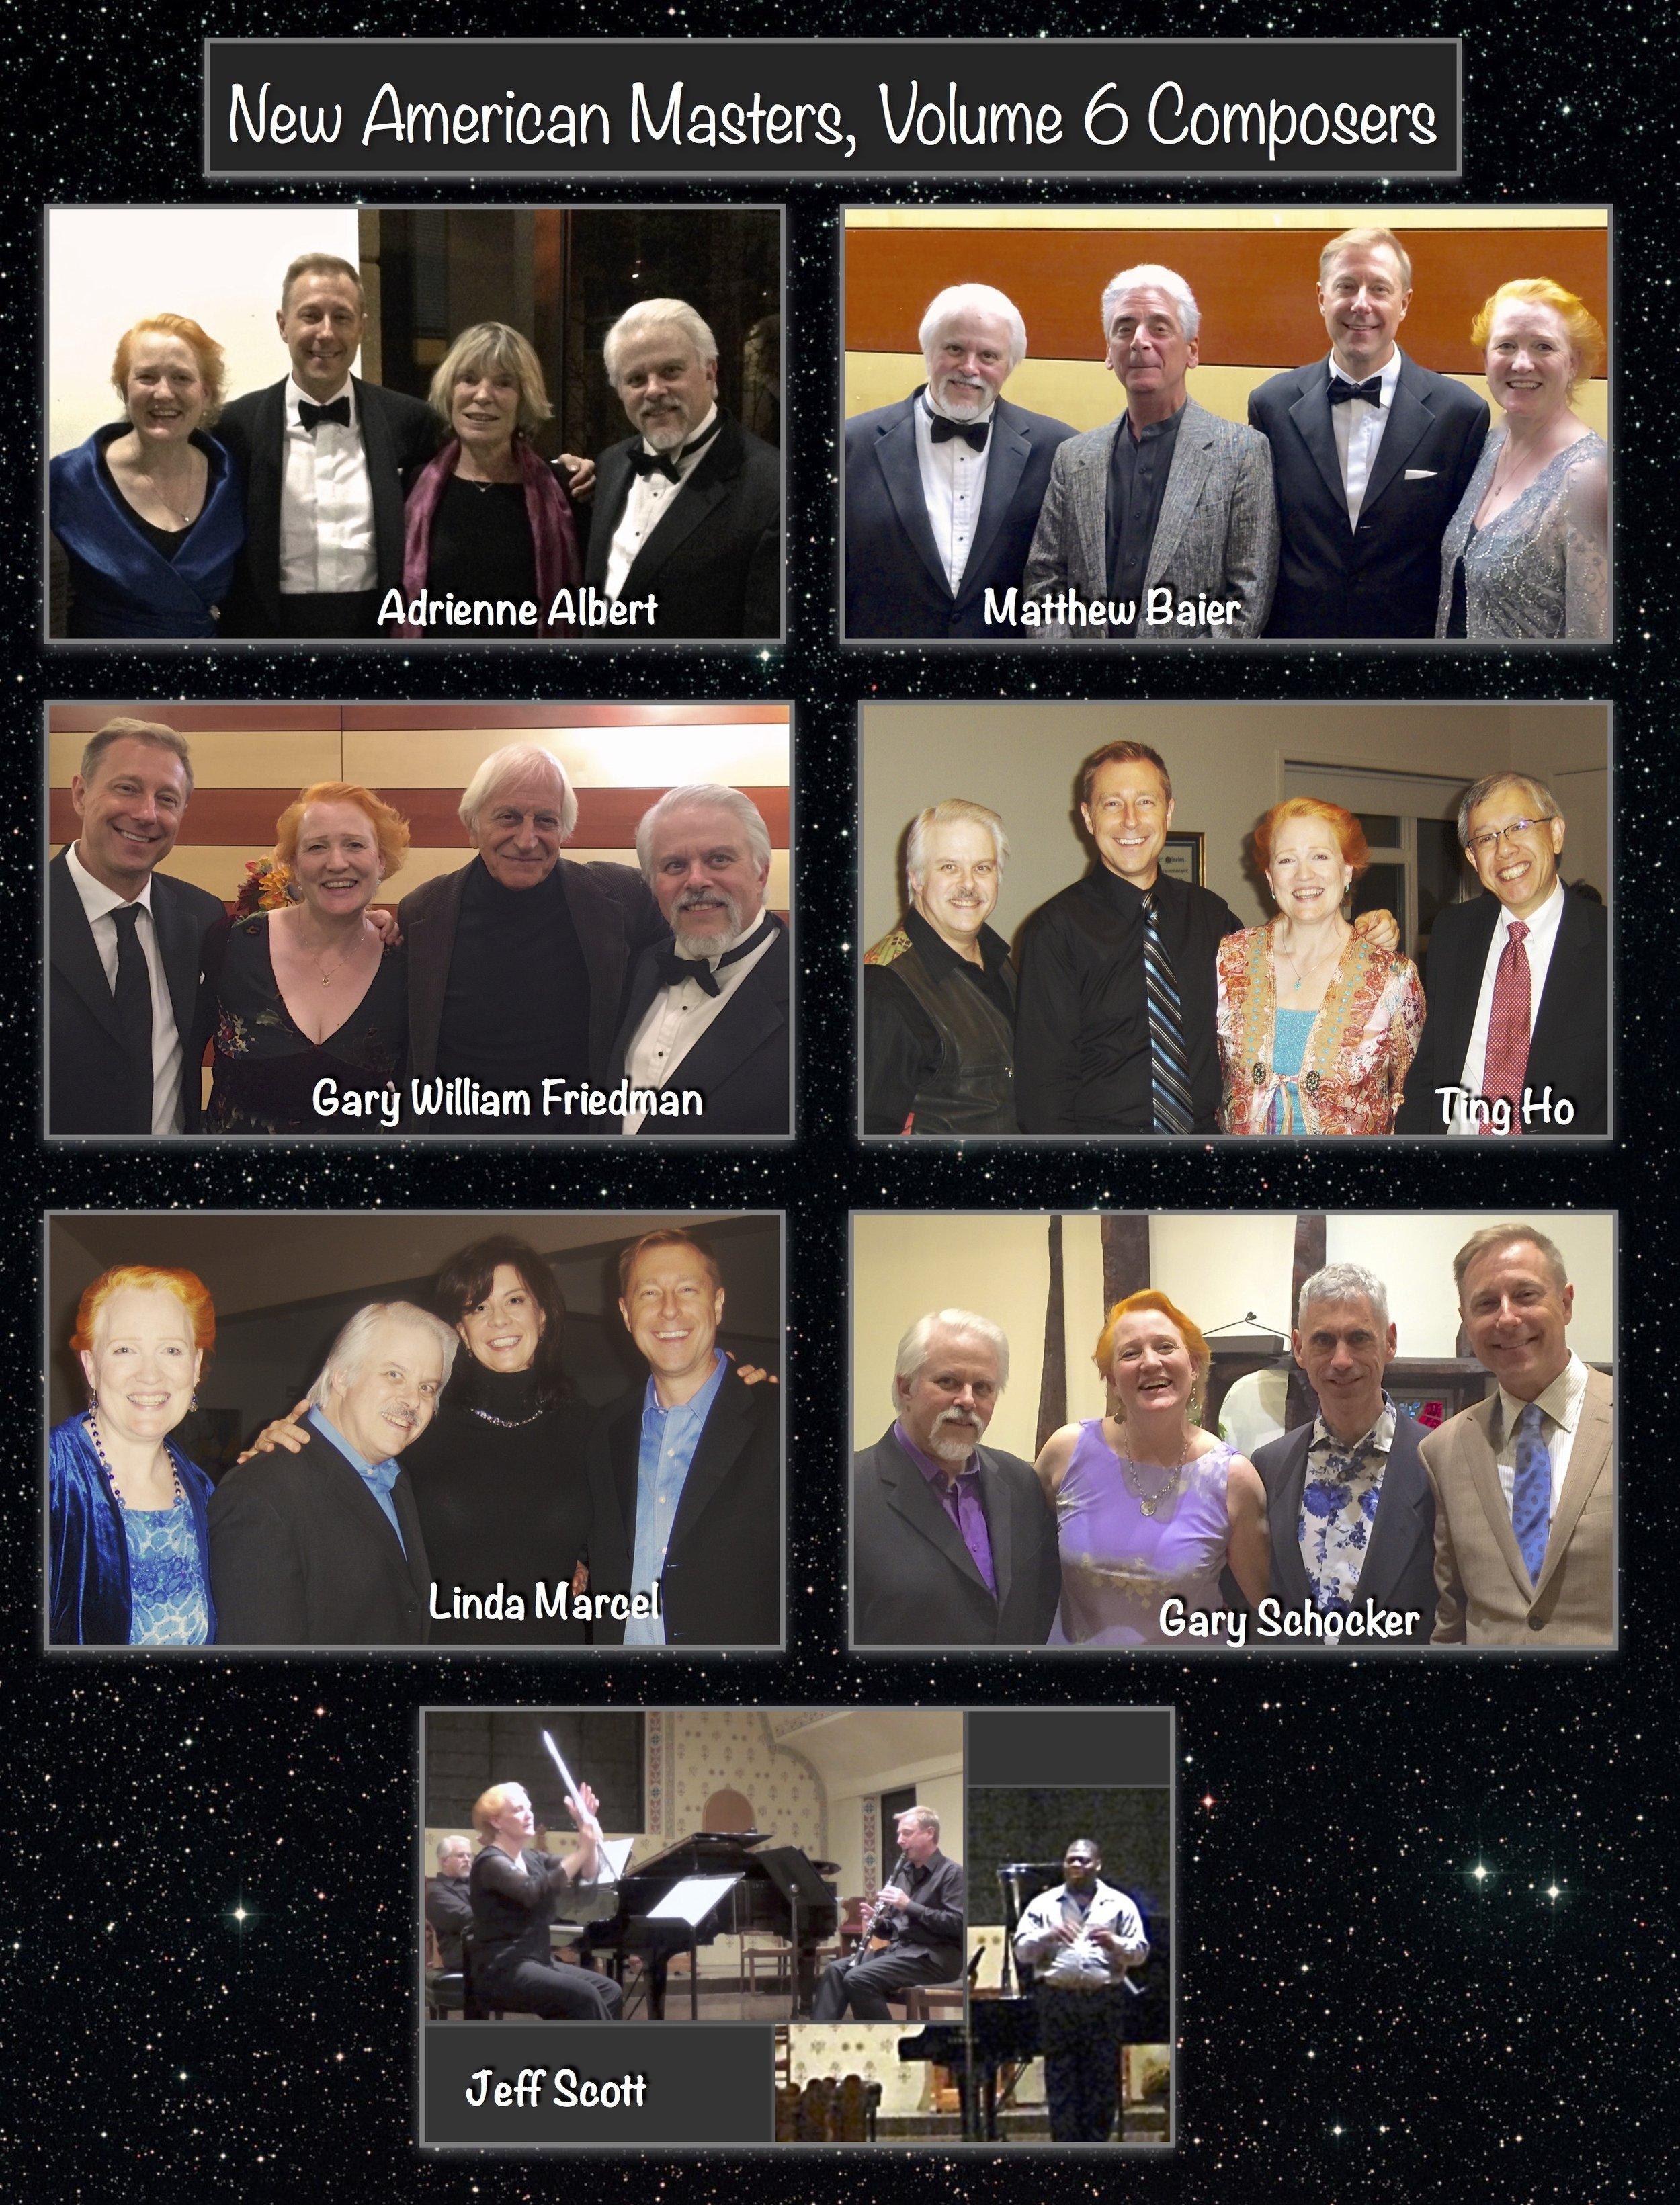 NAM6 Composer collage.jpg